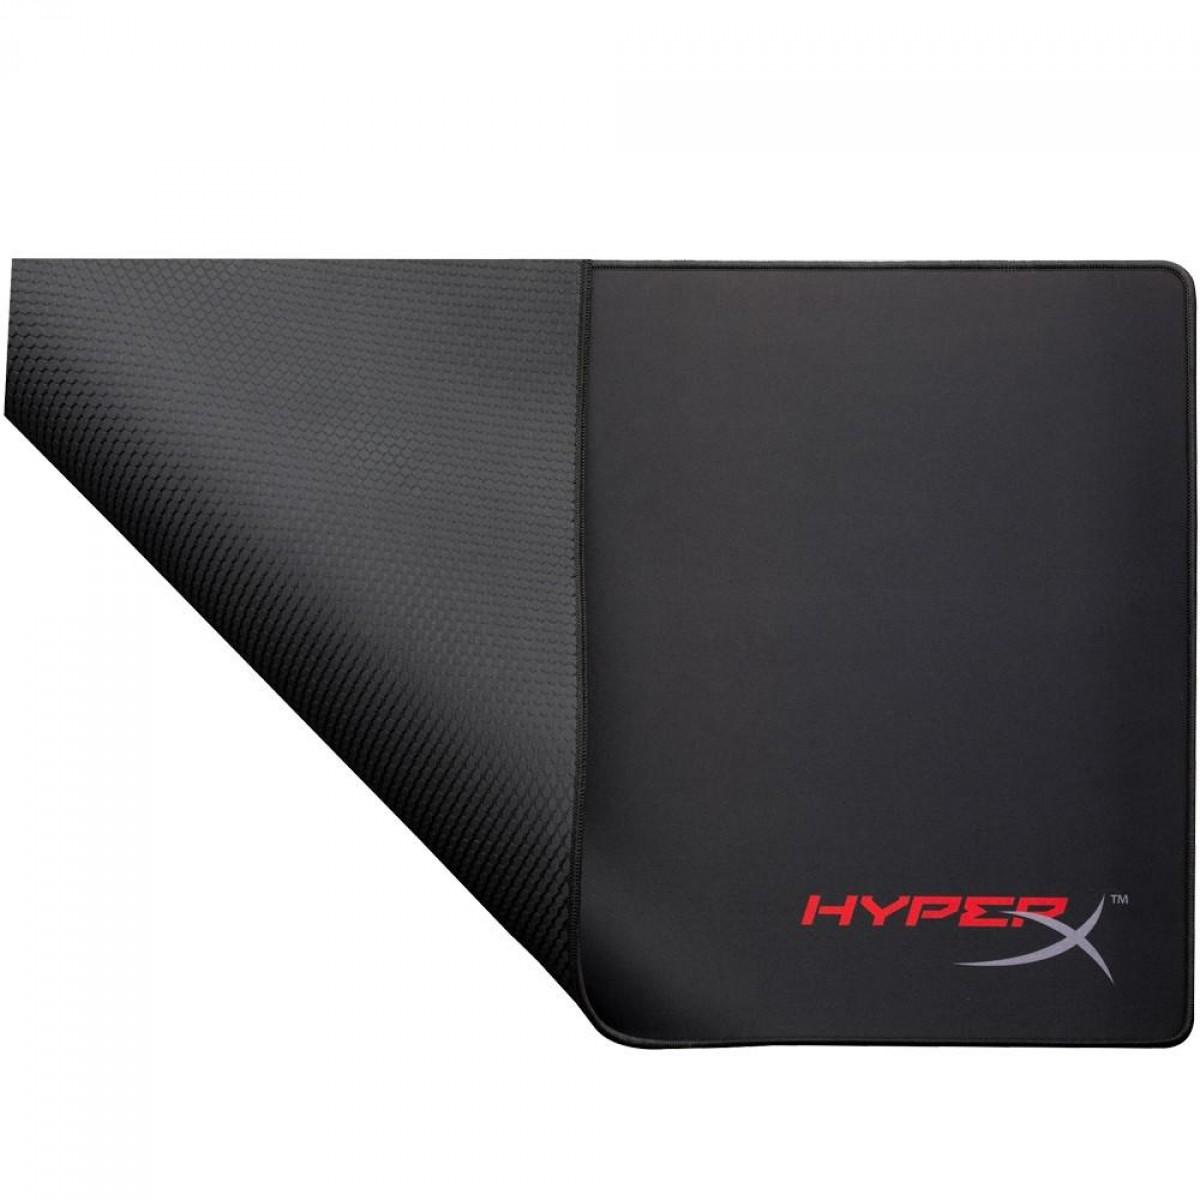 Mousepad Gamer HyperX Fury S Pro, Extra Grande, Black, HX-MPFS-XL